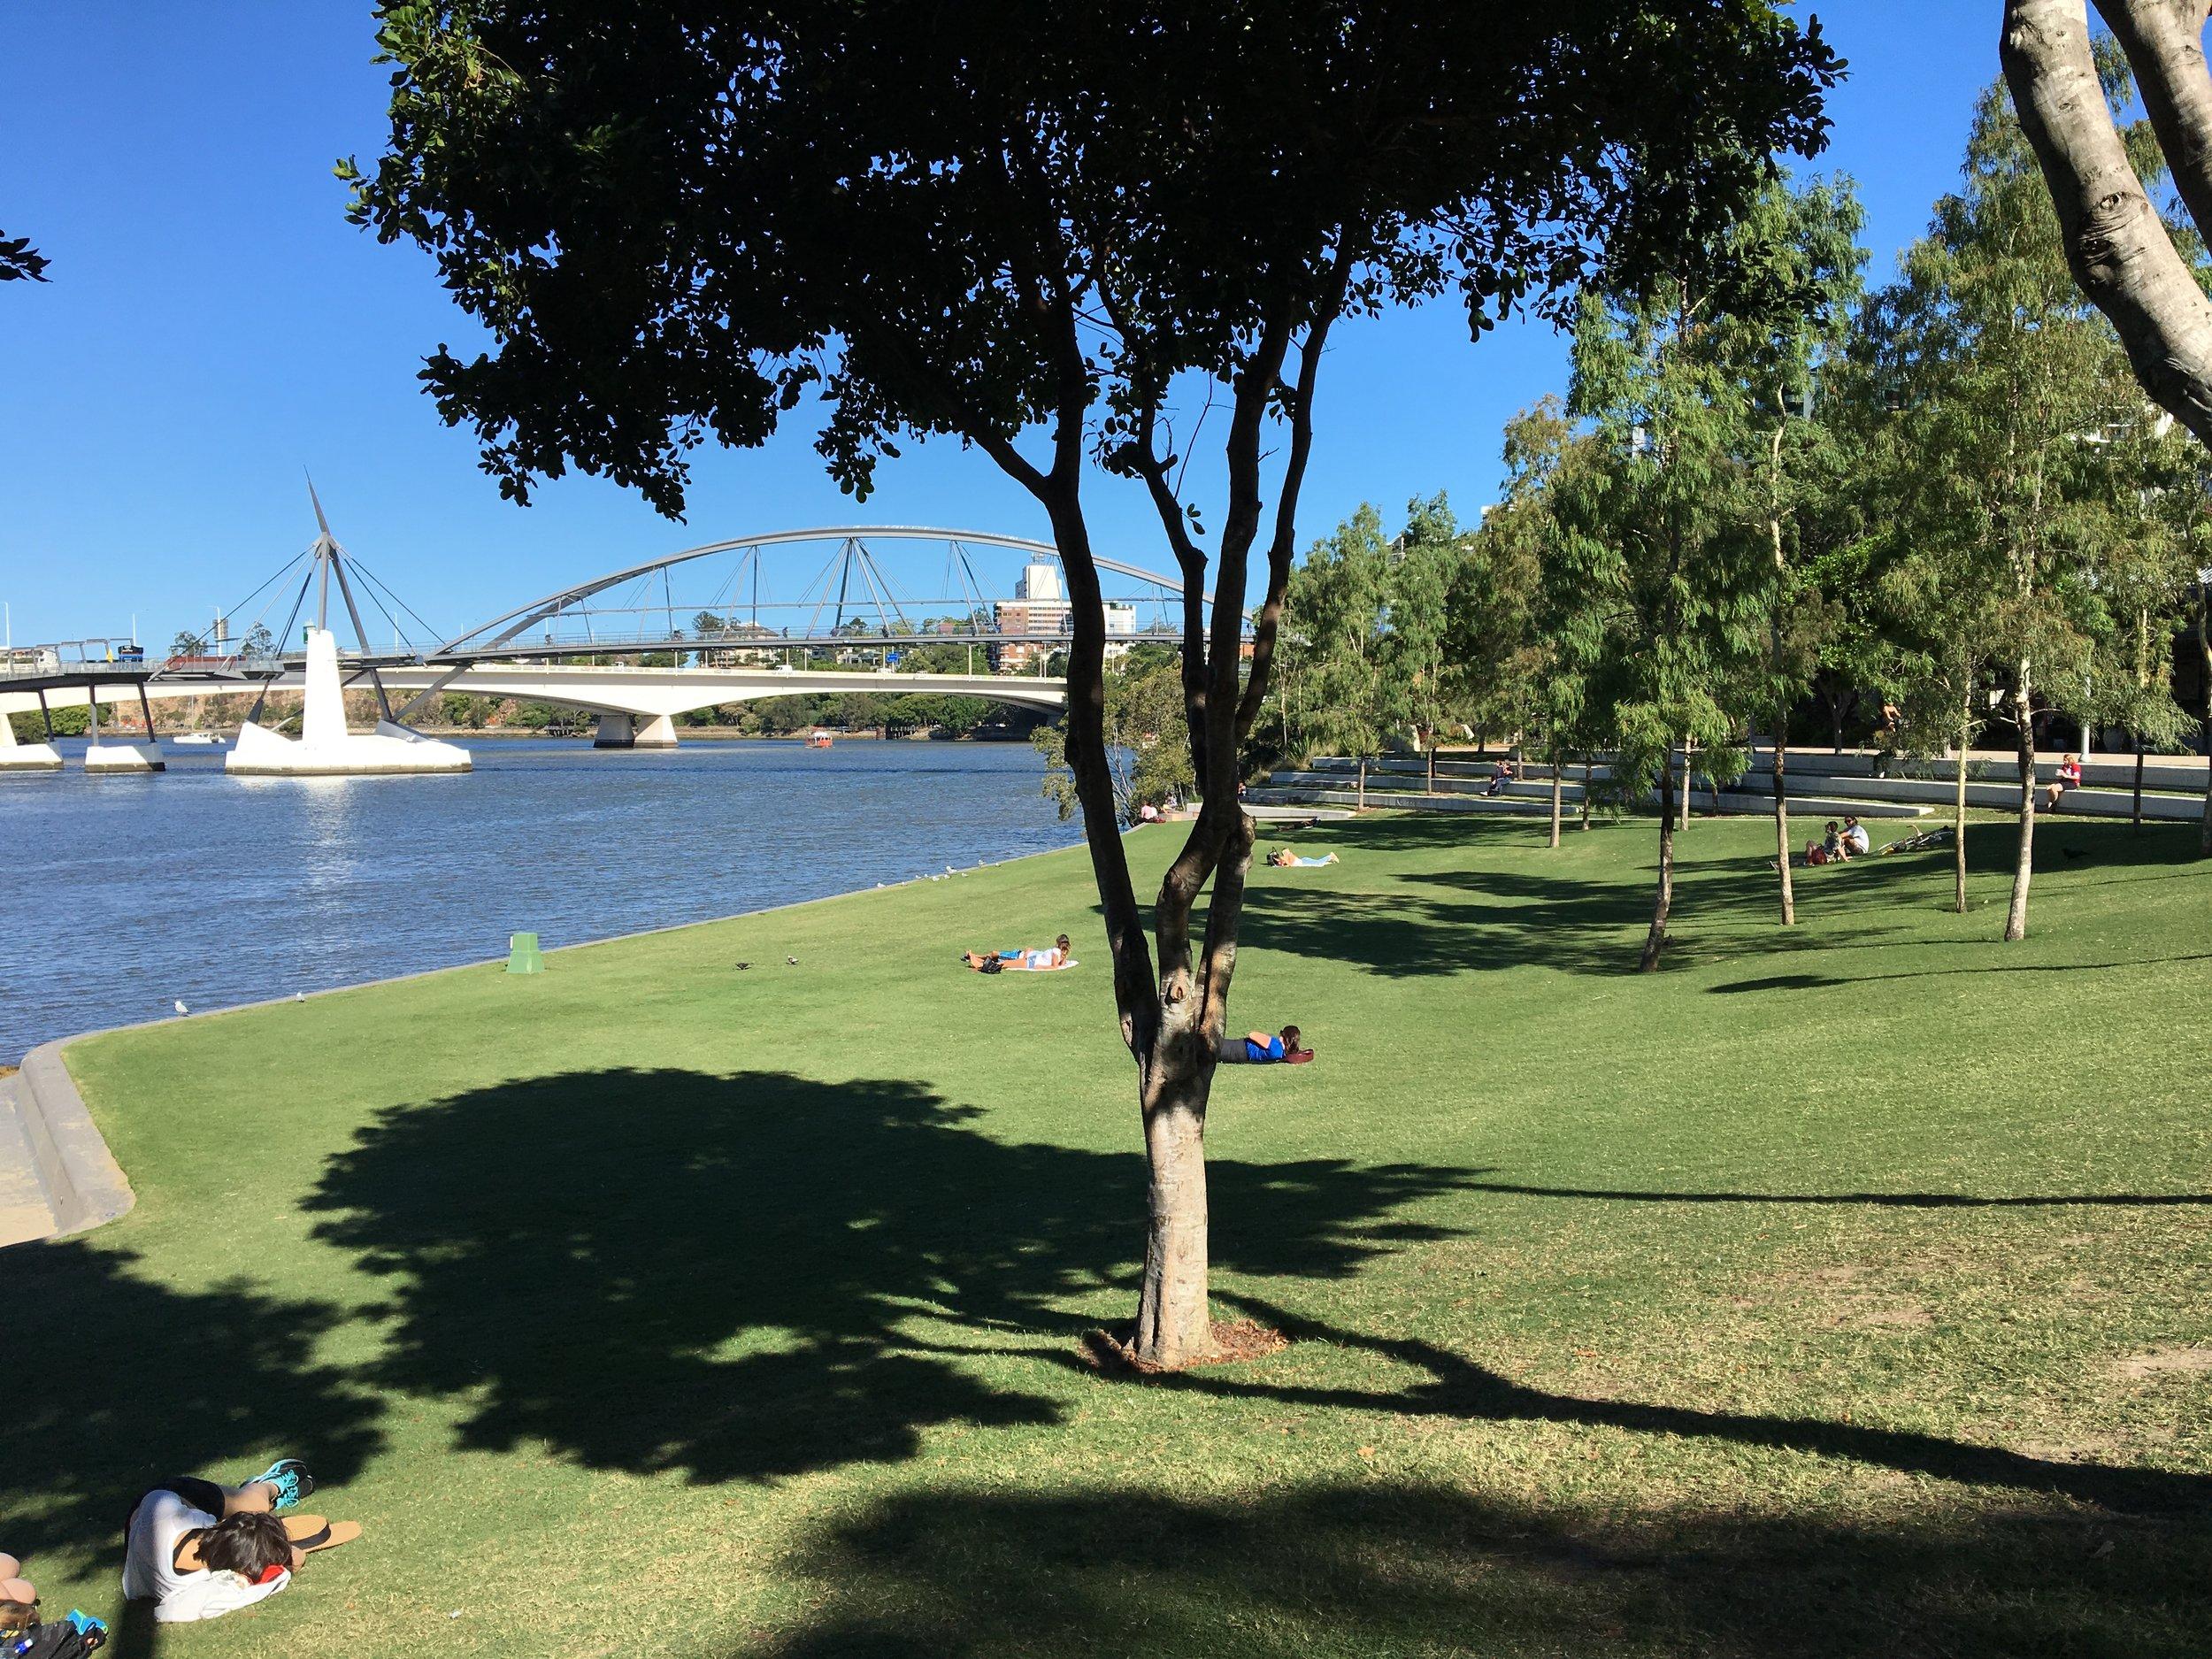 australia-brisbane-travel-southbank-promenade-7.JPG